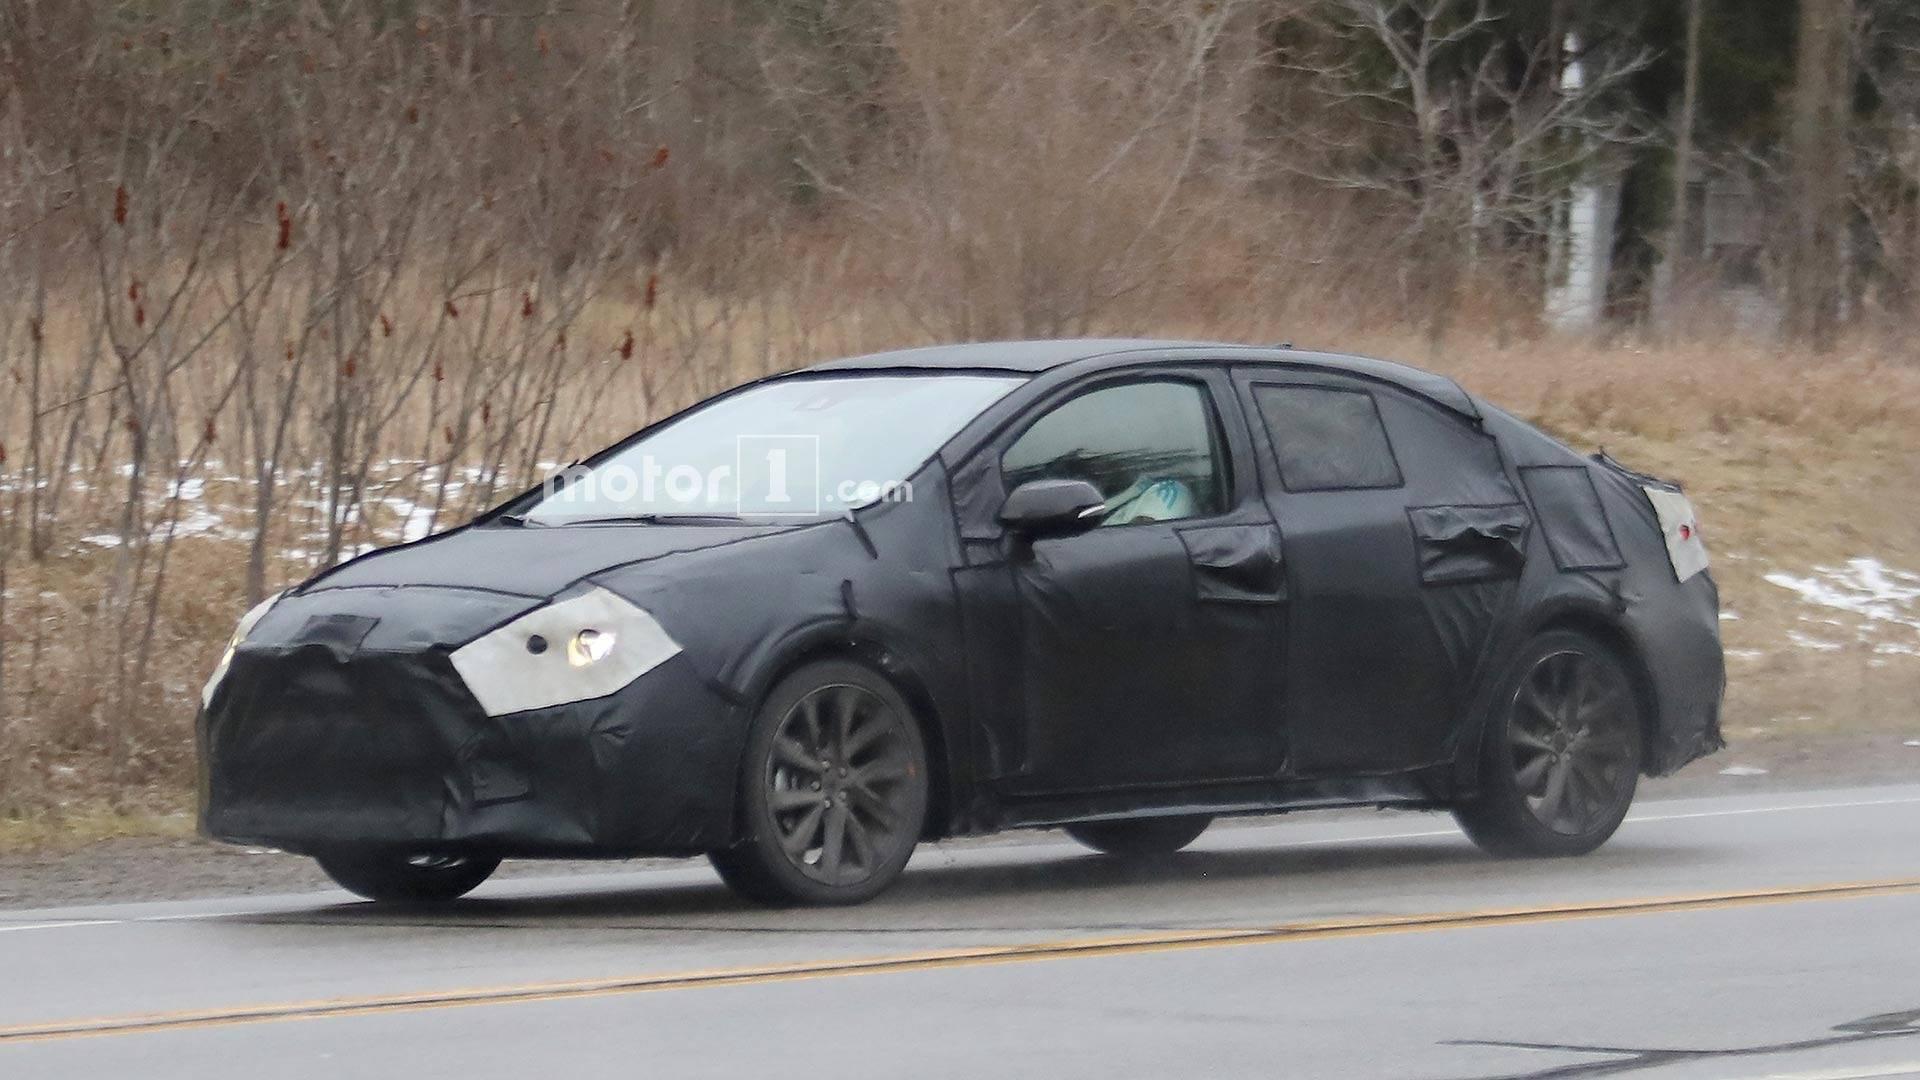 2018 - [Toyota] Corolla Sedan 2020-toyota-corolla-spy-shots